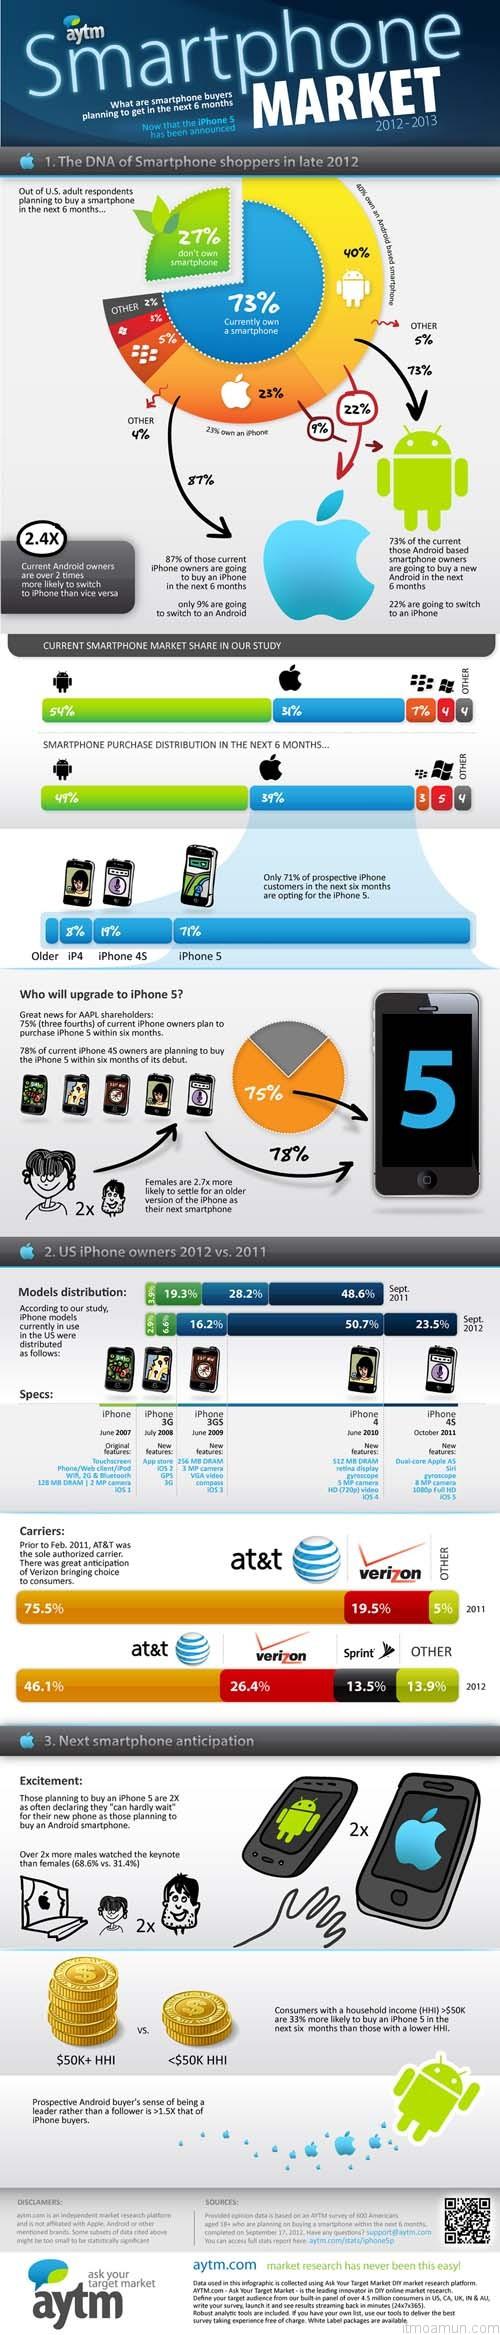 Smartphone Market 2012-2013